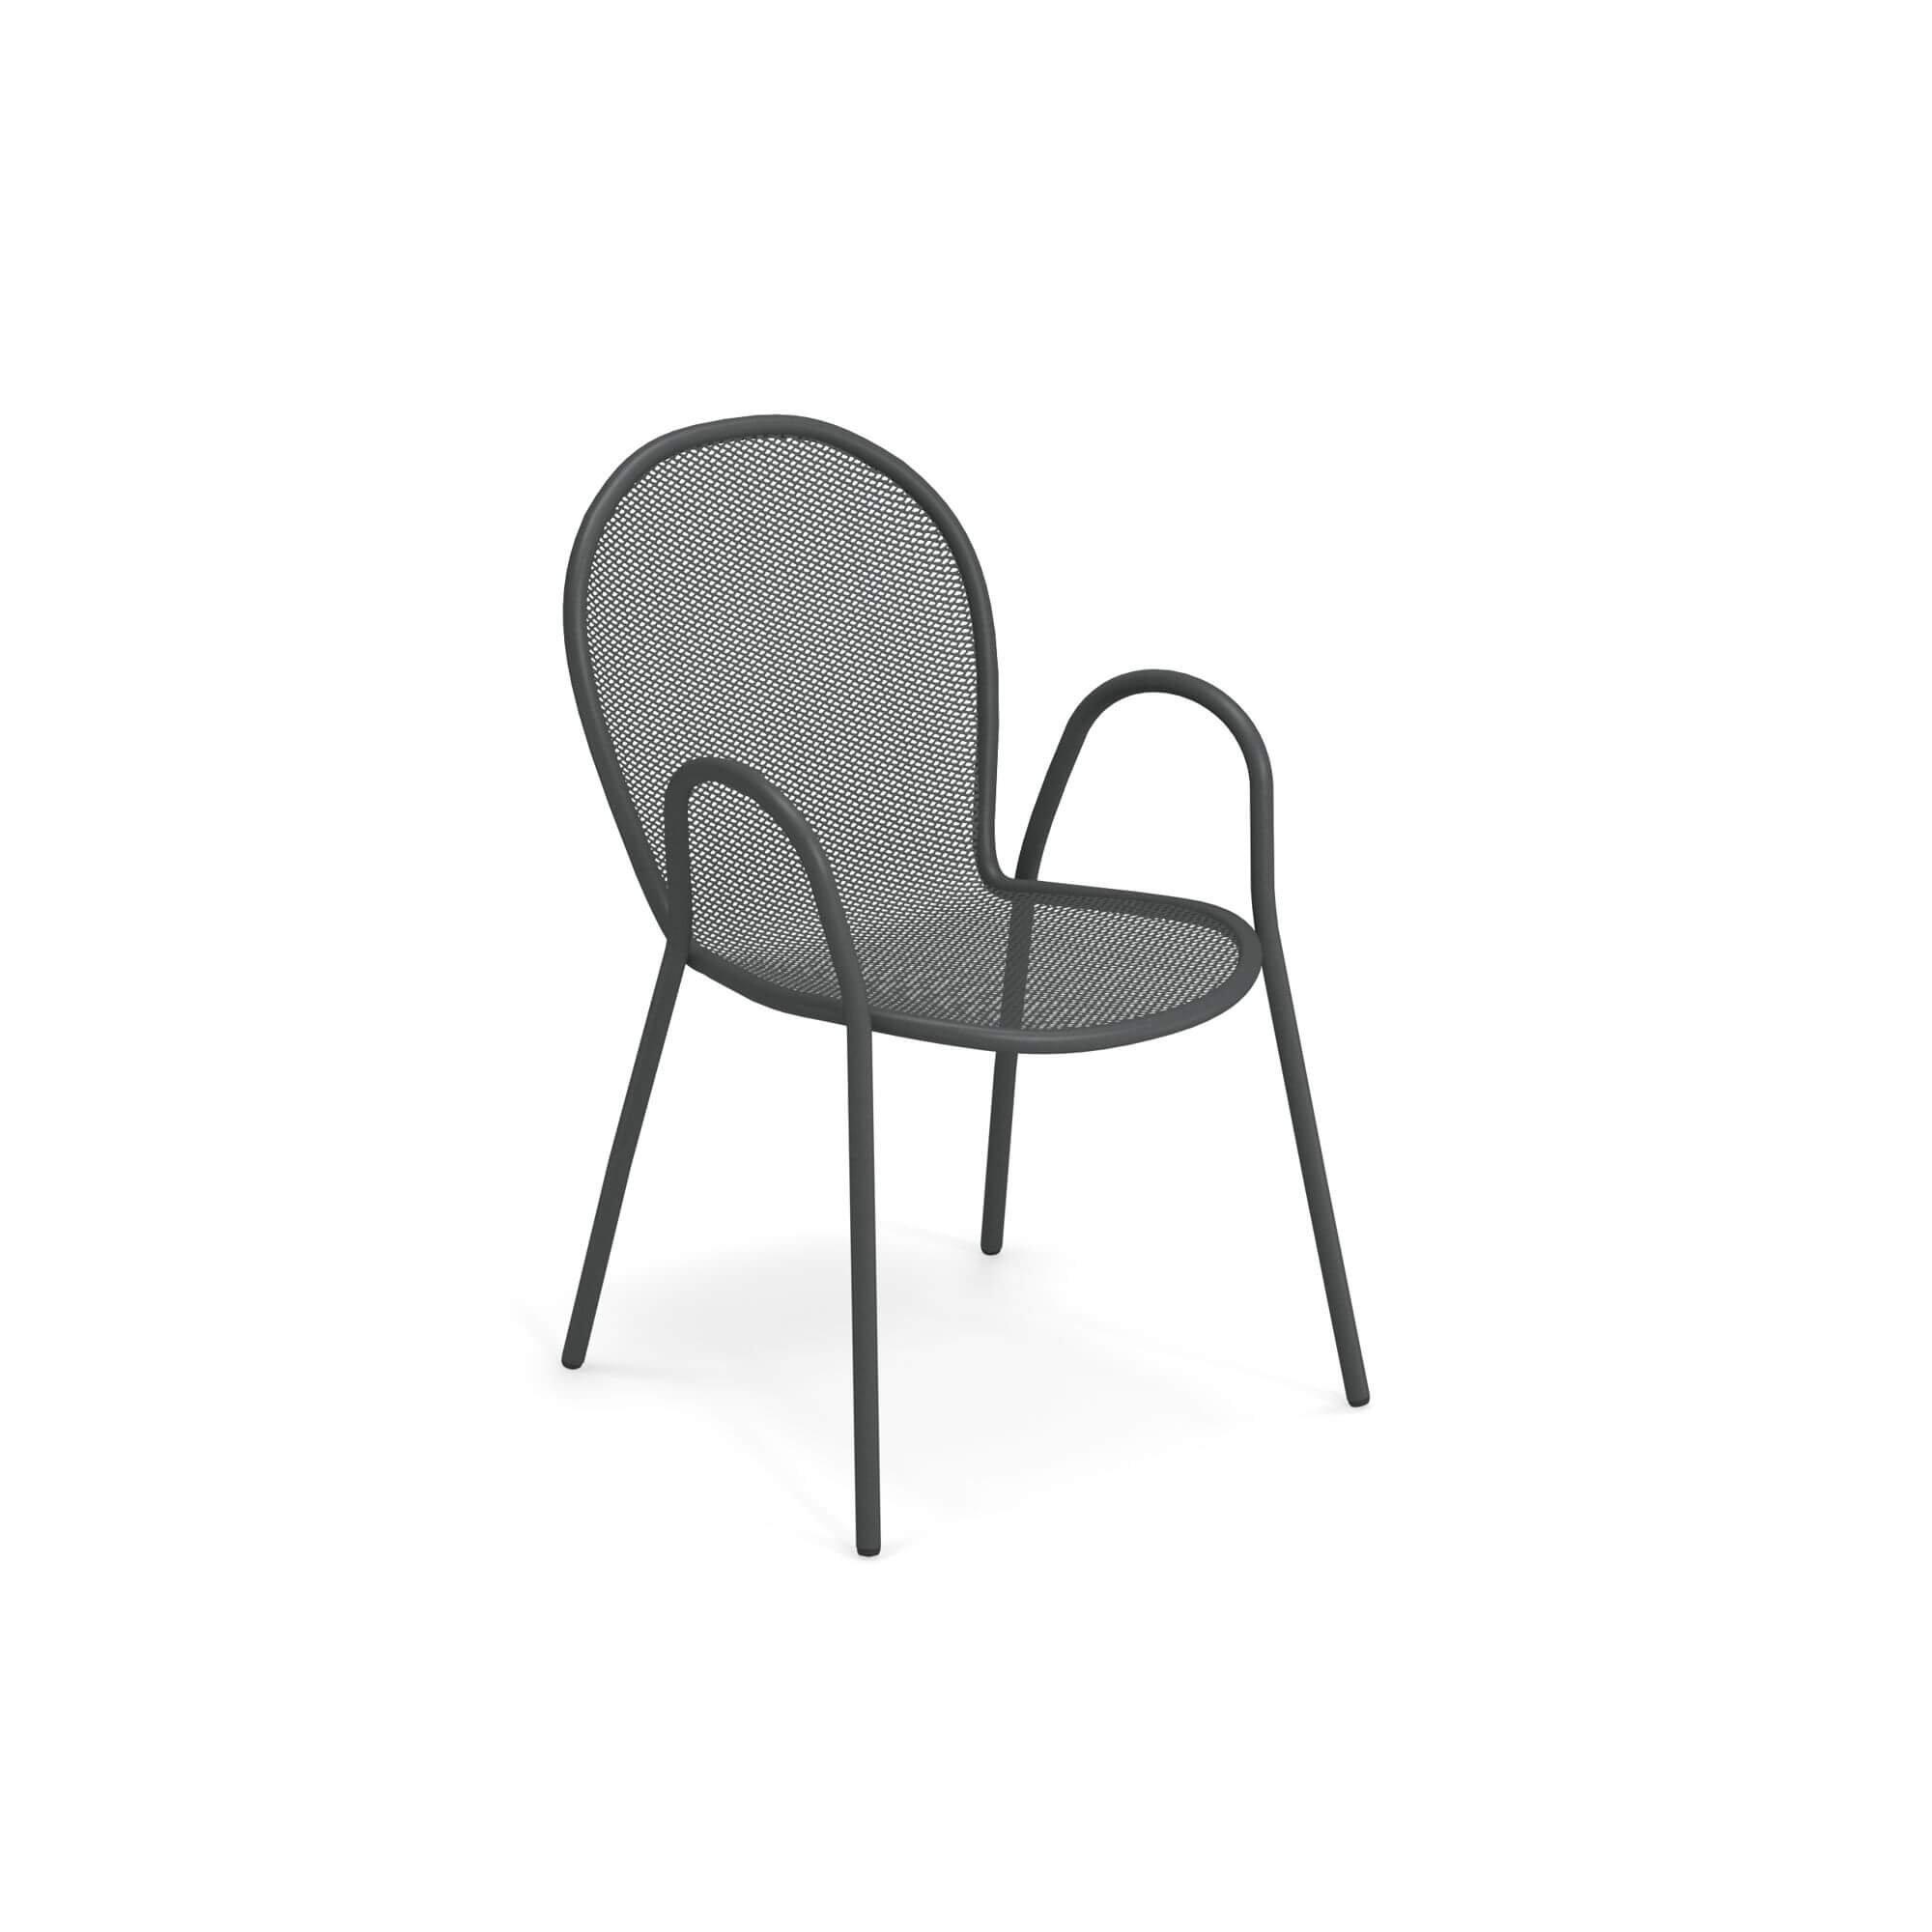 Ronda Armchair from Emu, designed by Aldo Ciabatti